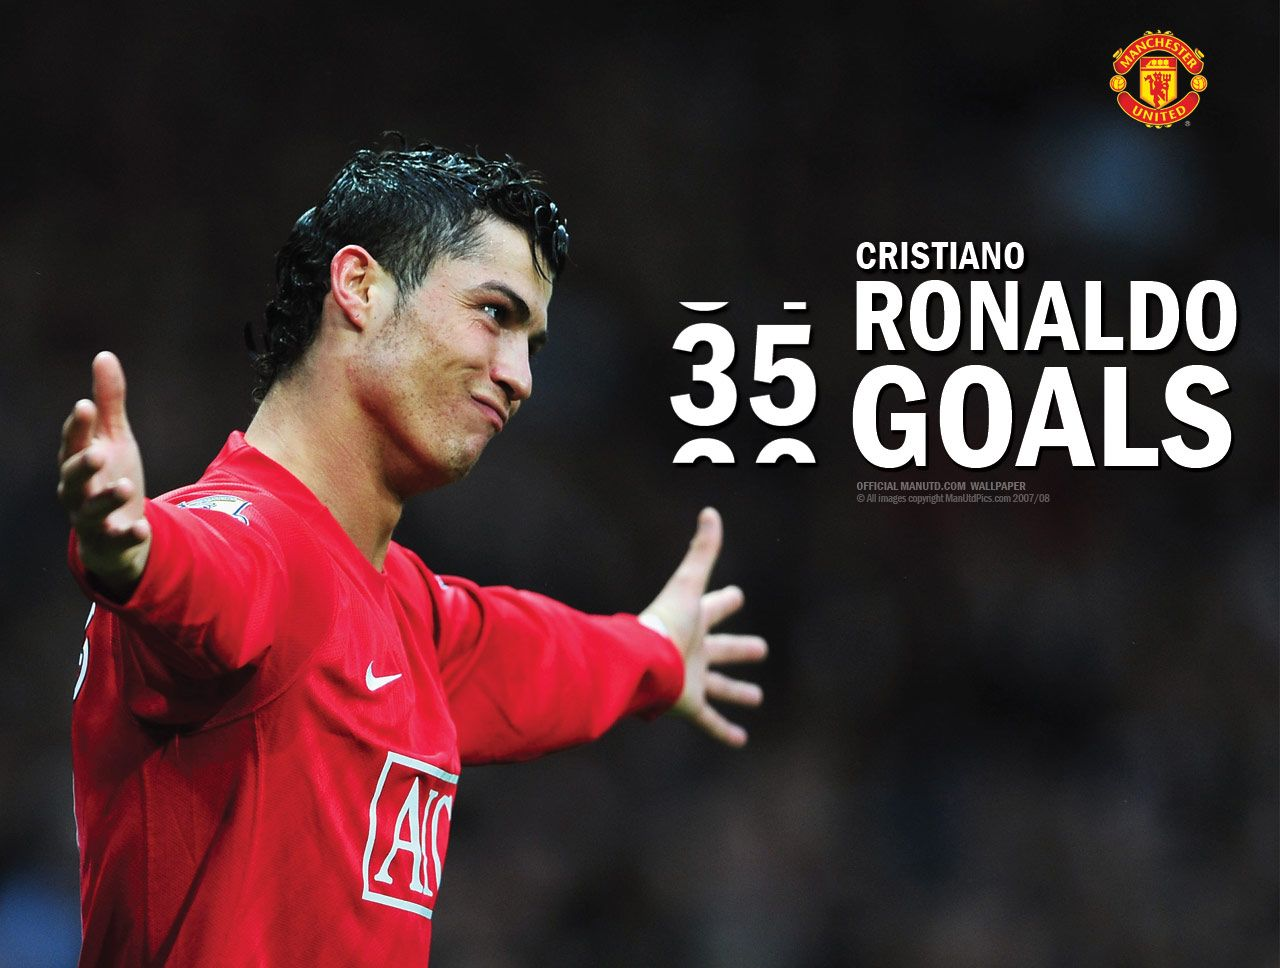 http://3.bp.blogspot.com/_T0UP2pQgRfA/THQ1eaA7qOI/AAAAAAAABIc/V2CsQqfd6mk/s1600/Cristiano+Ronaldo+Wallpaper+0108.jpg